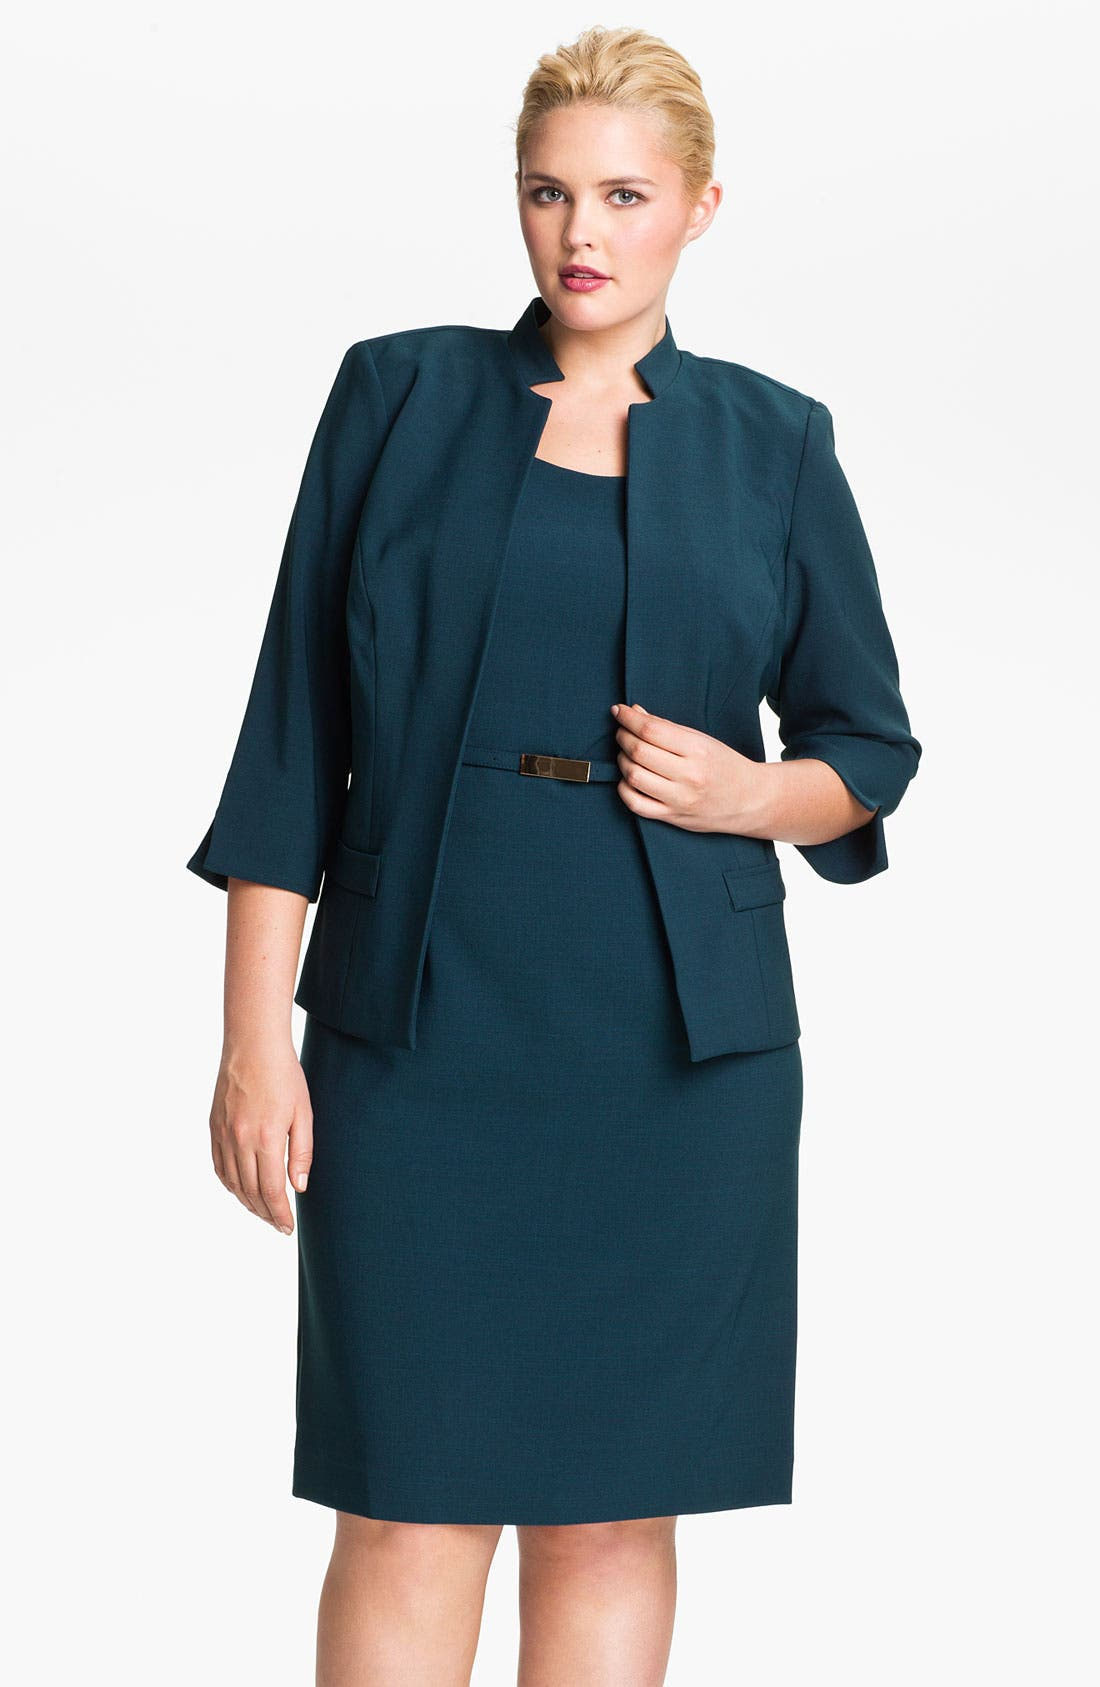 Alternate Image 1 Selected - Eliza J Belted Sheath Dress & Jacket (Plus)